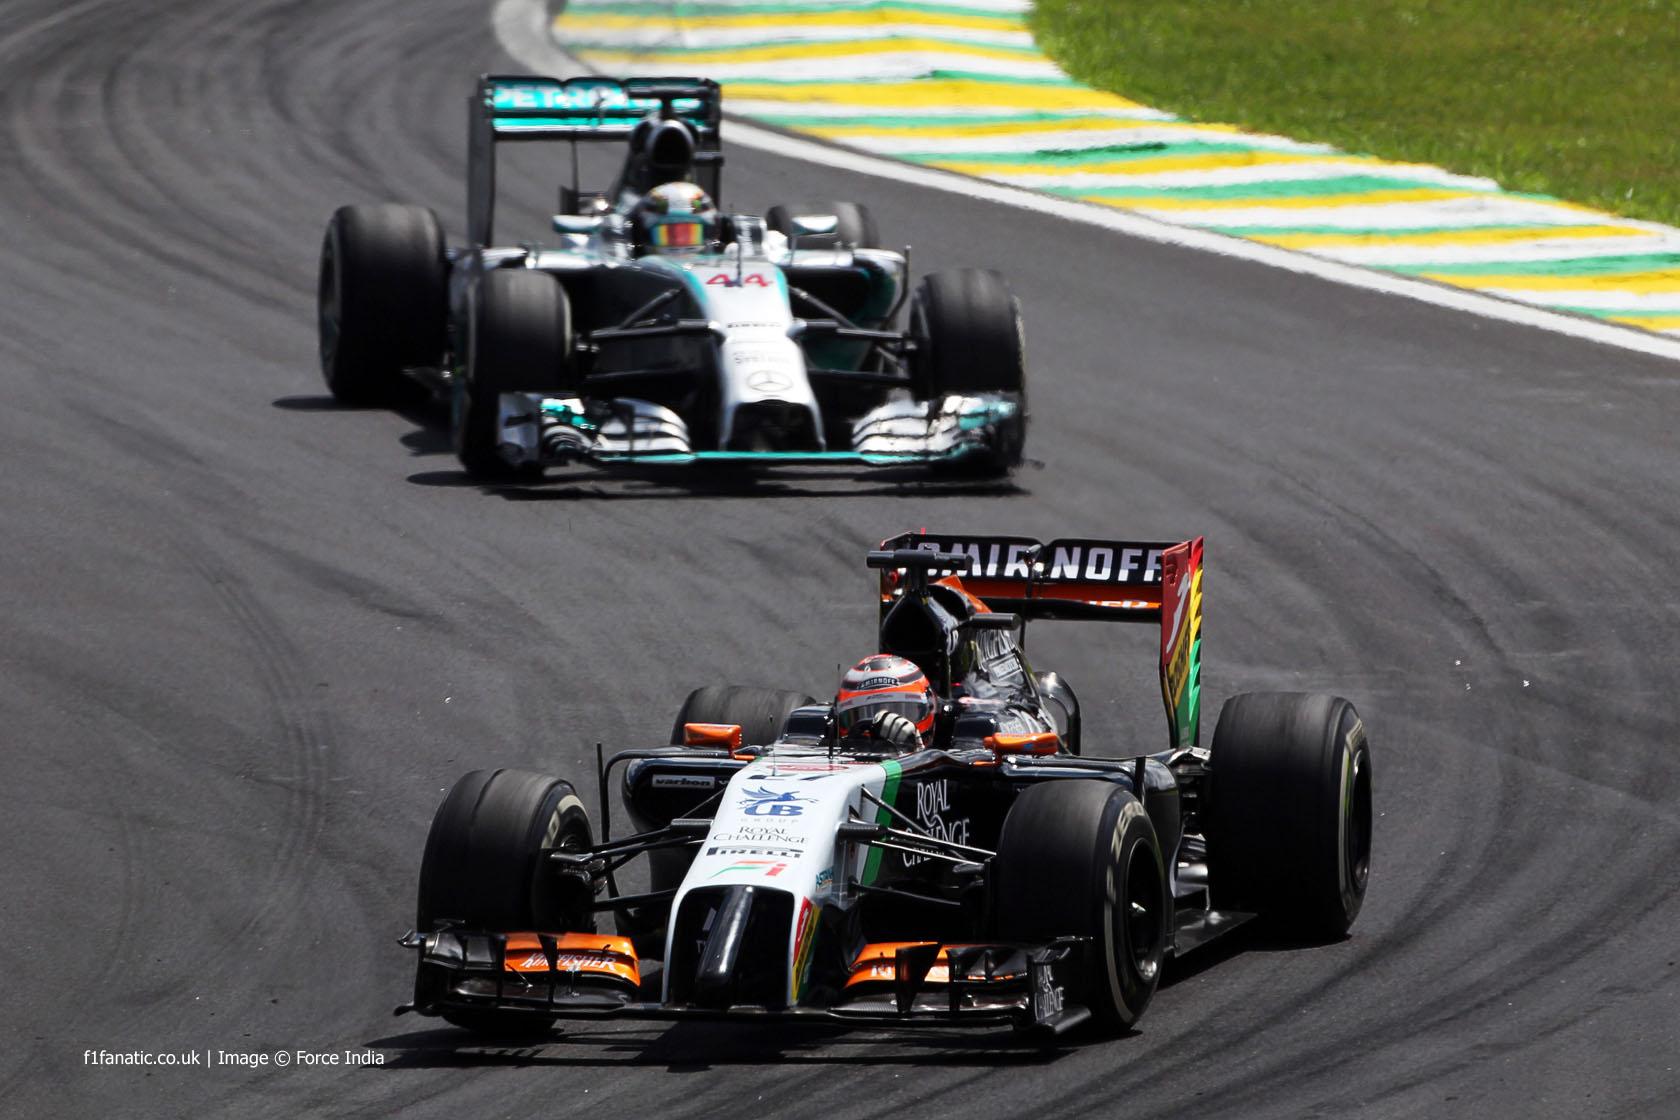 Nico Hulkenberg, Force India, Interlagos, 2014